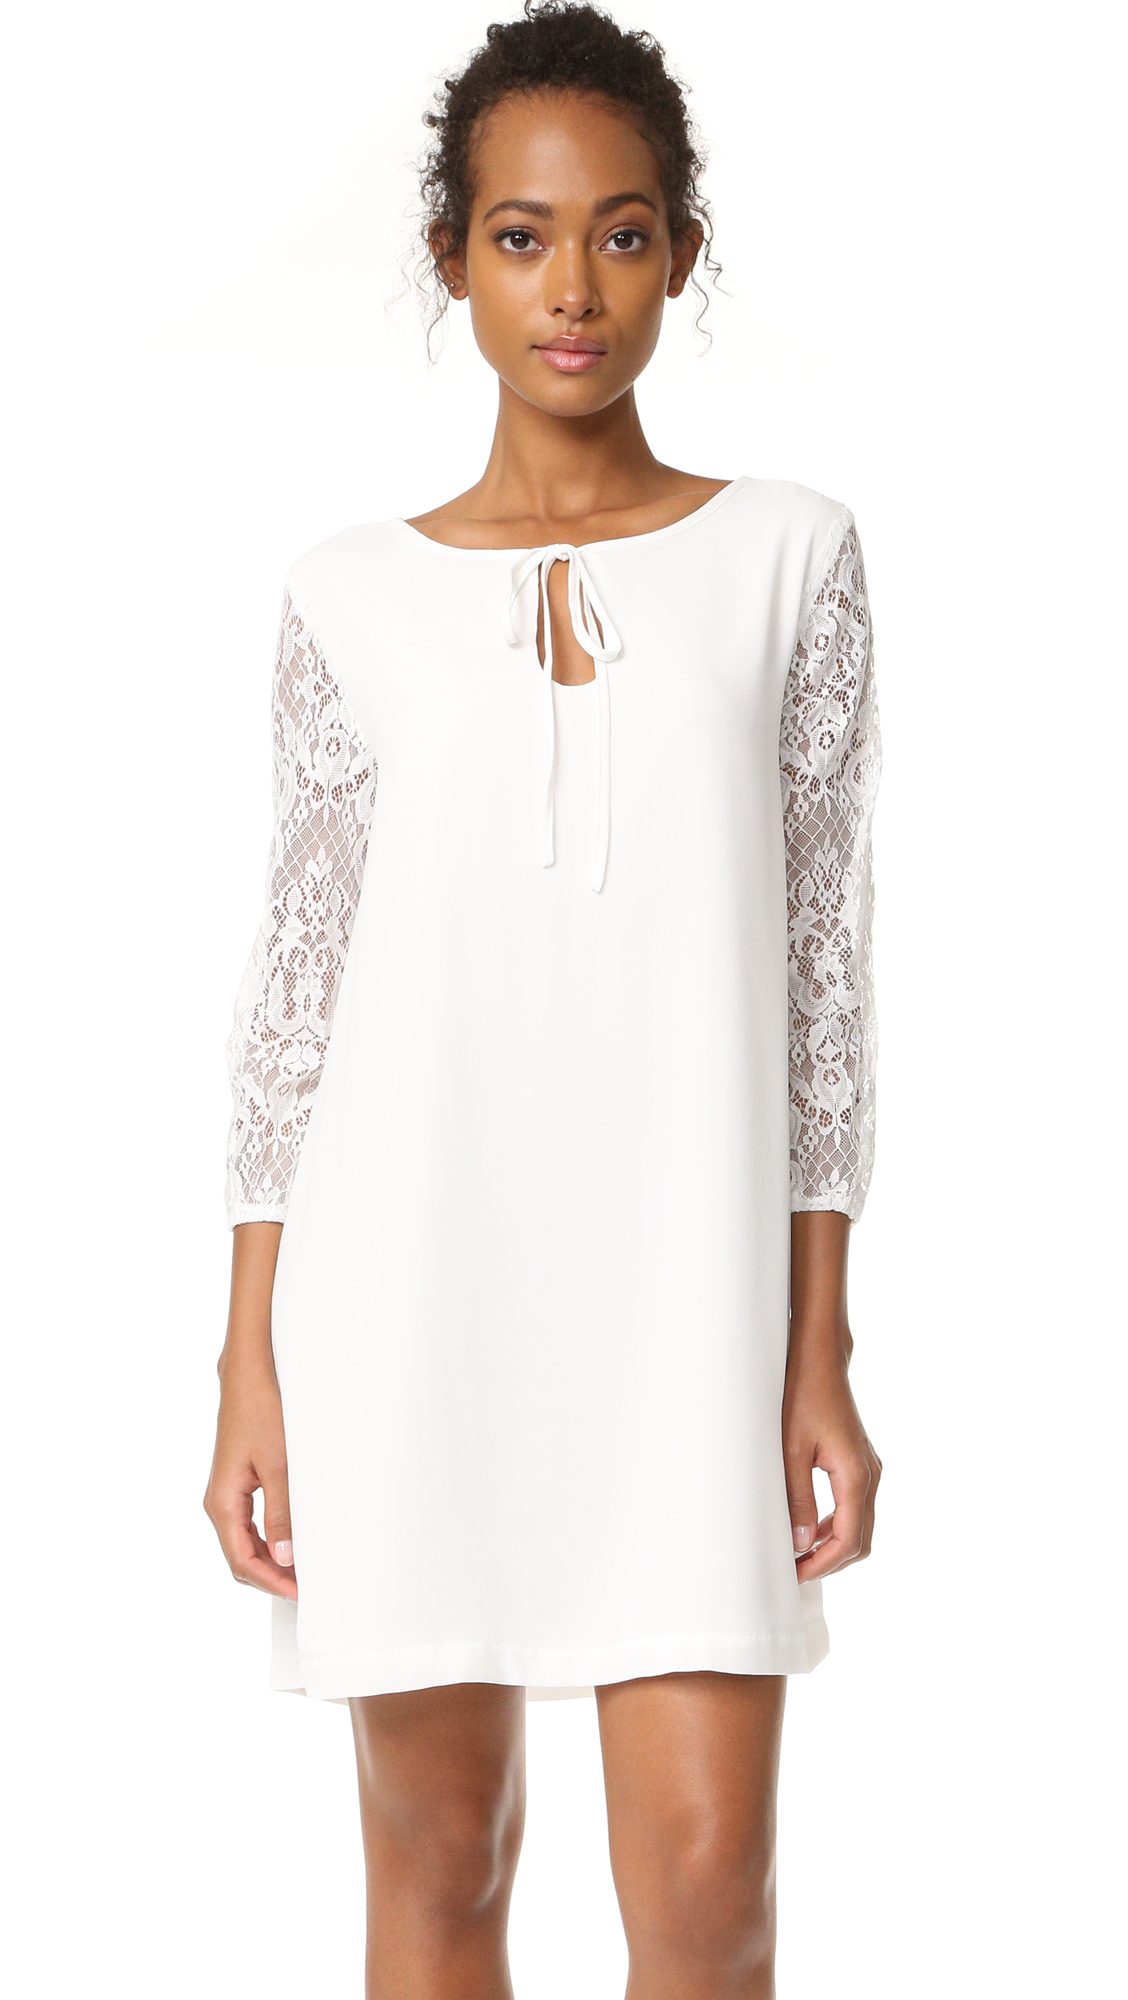 Bb Dakota Helene Lace Dress Shopbop Save Up To 25 Use